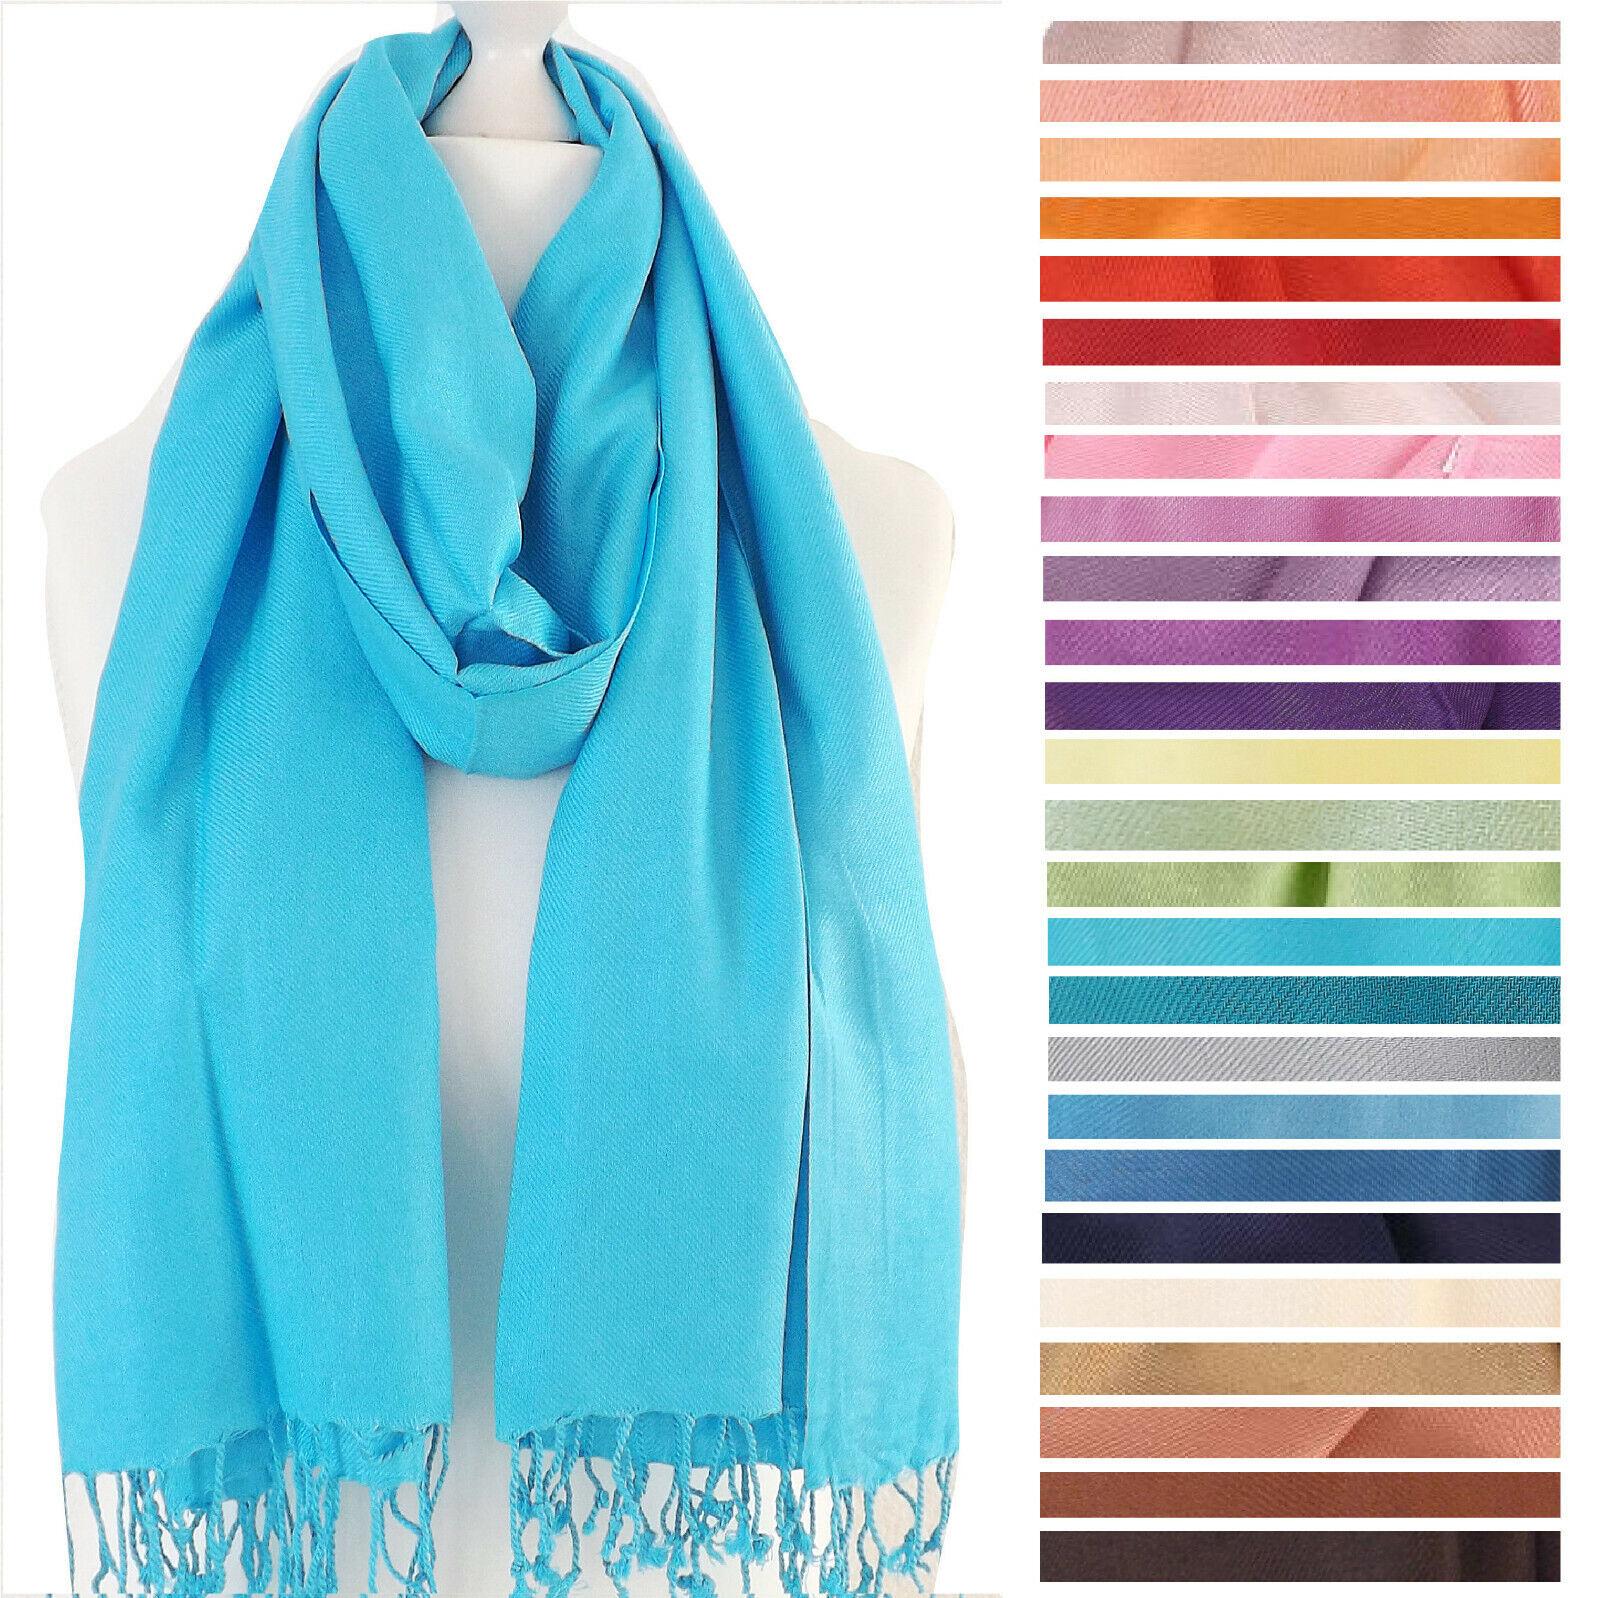 30 FARBEN - Pashmina Langschal Schal Fransen Damen unifarben einfarbig Viskose